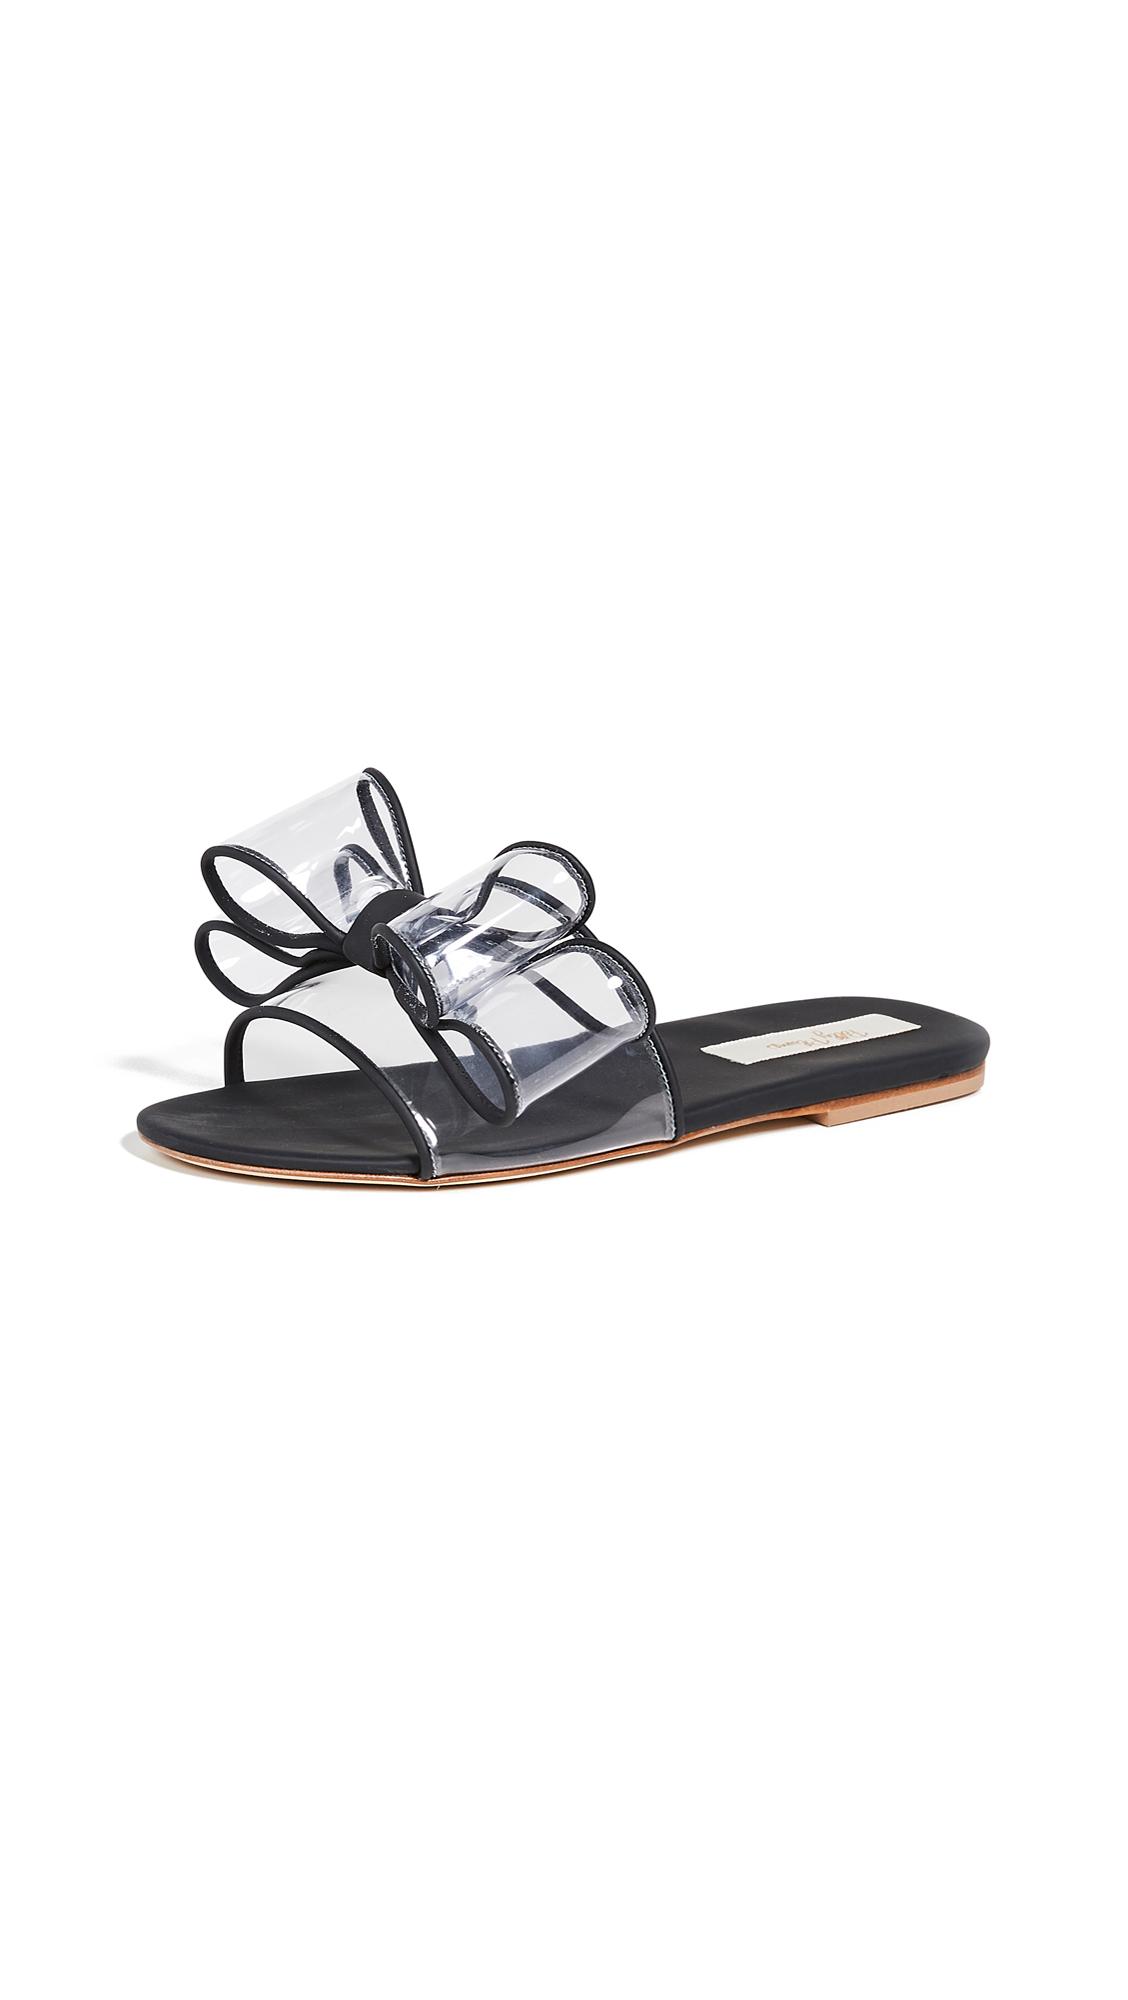 Polly Plume Lola Bow Slides - Black